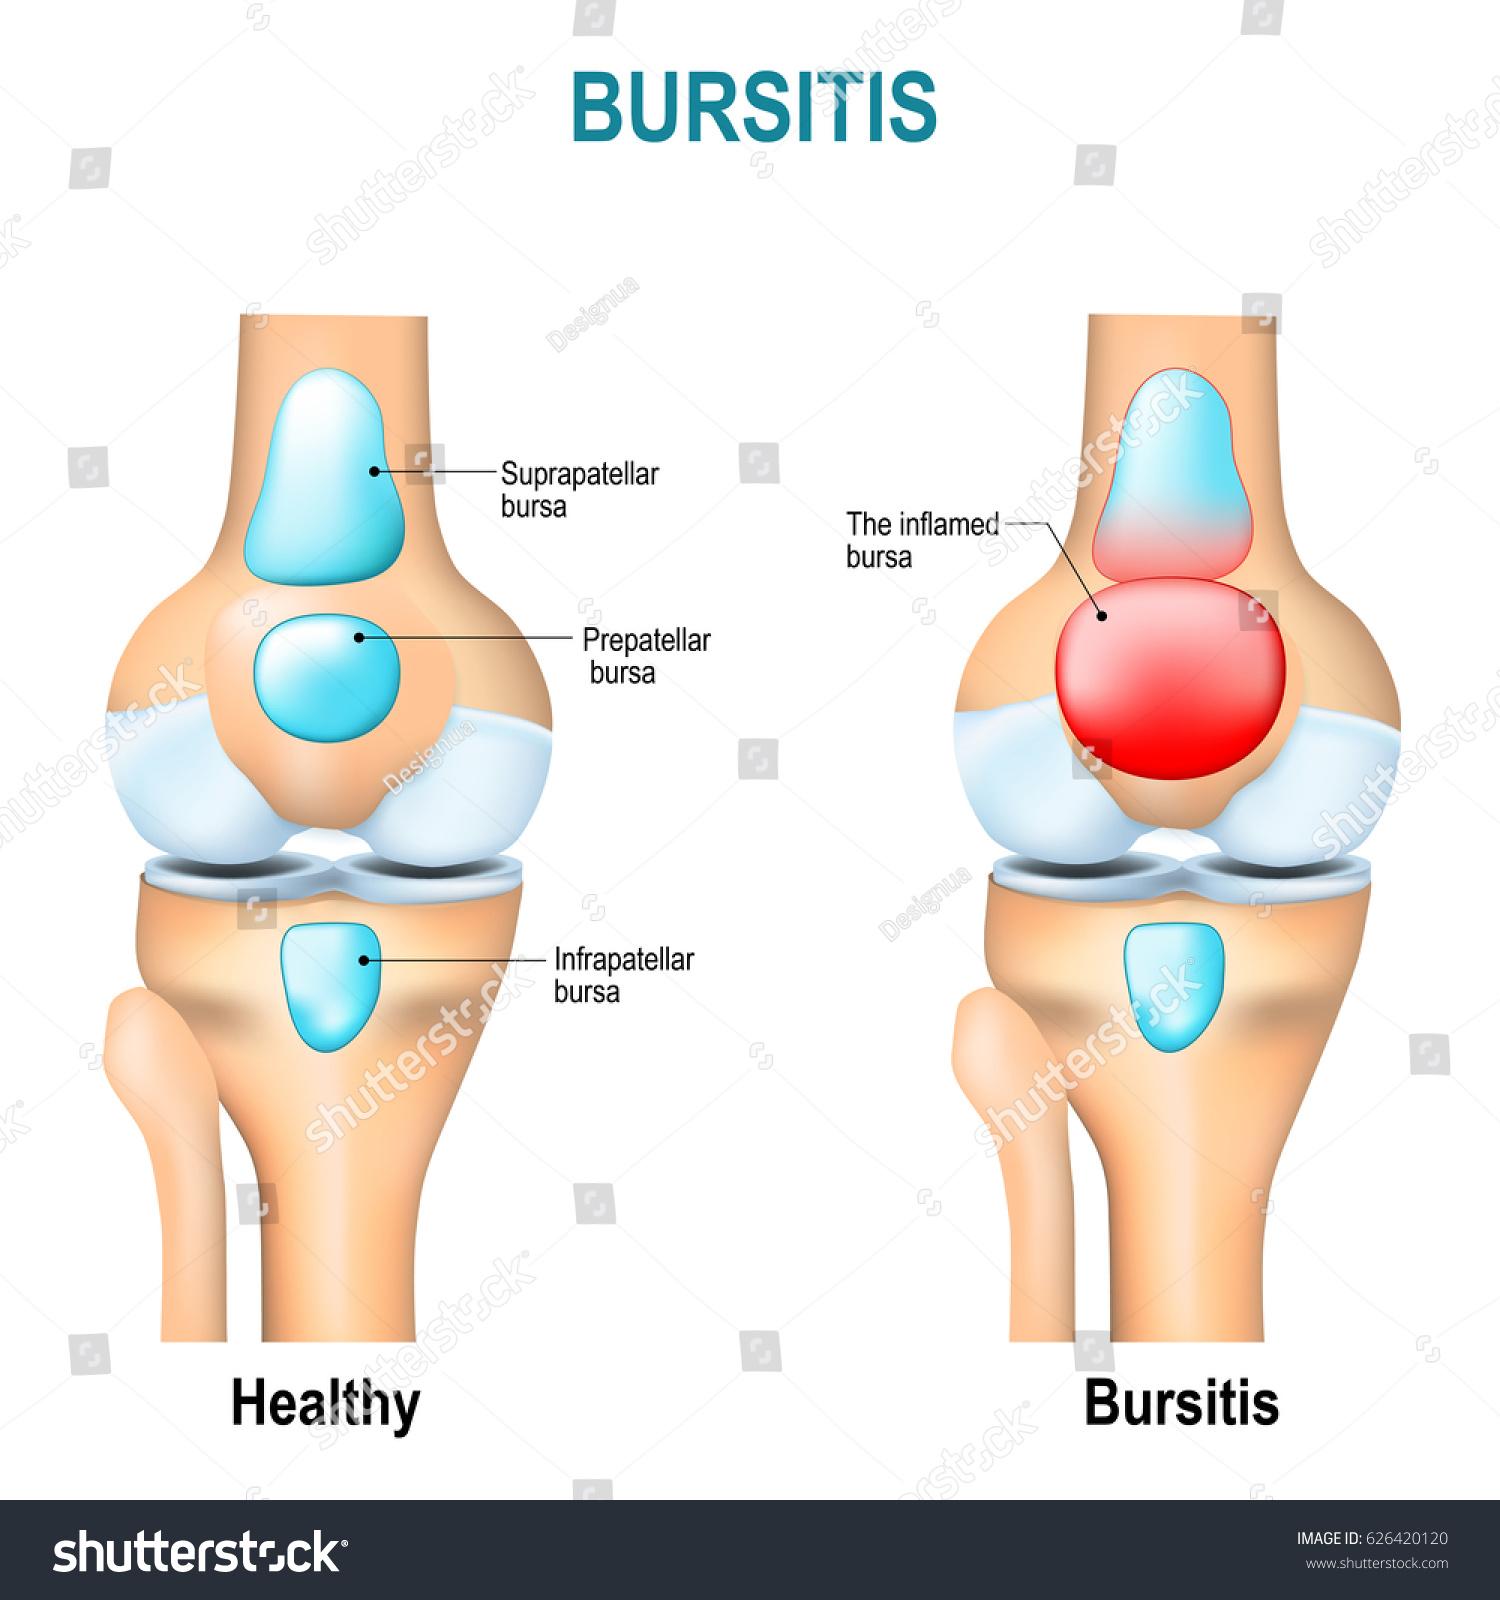 Bursitis healthy humans knee knee inflammation stock illustration bursitis healthy humans knee and knee with inflammation of bursae synovial fluid ccuart Choice Image